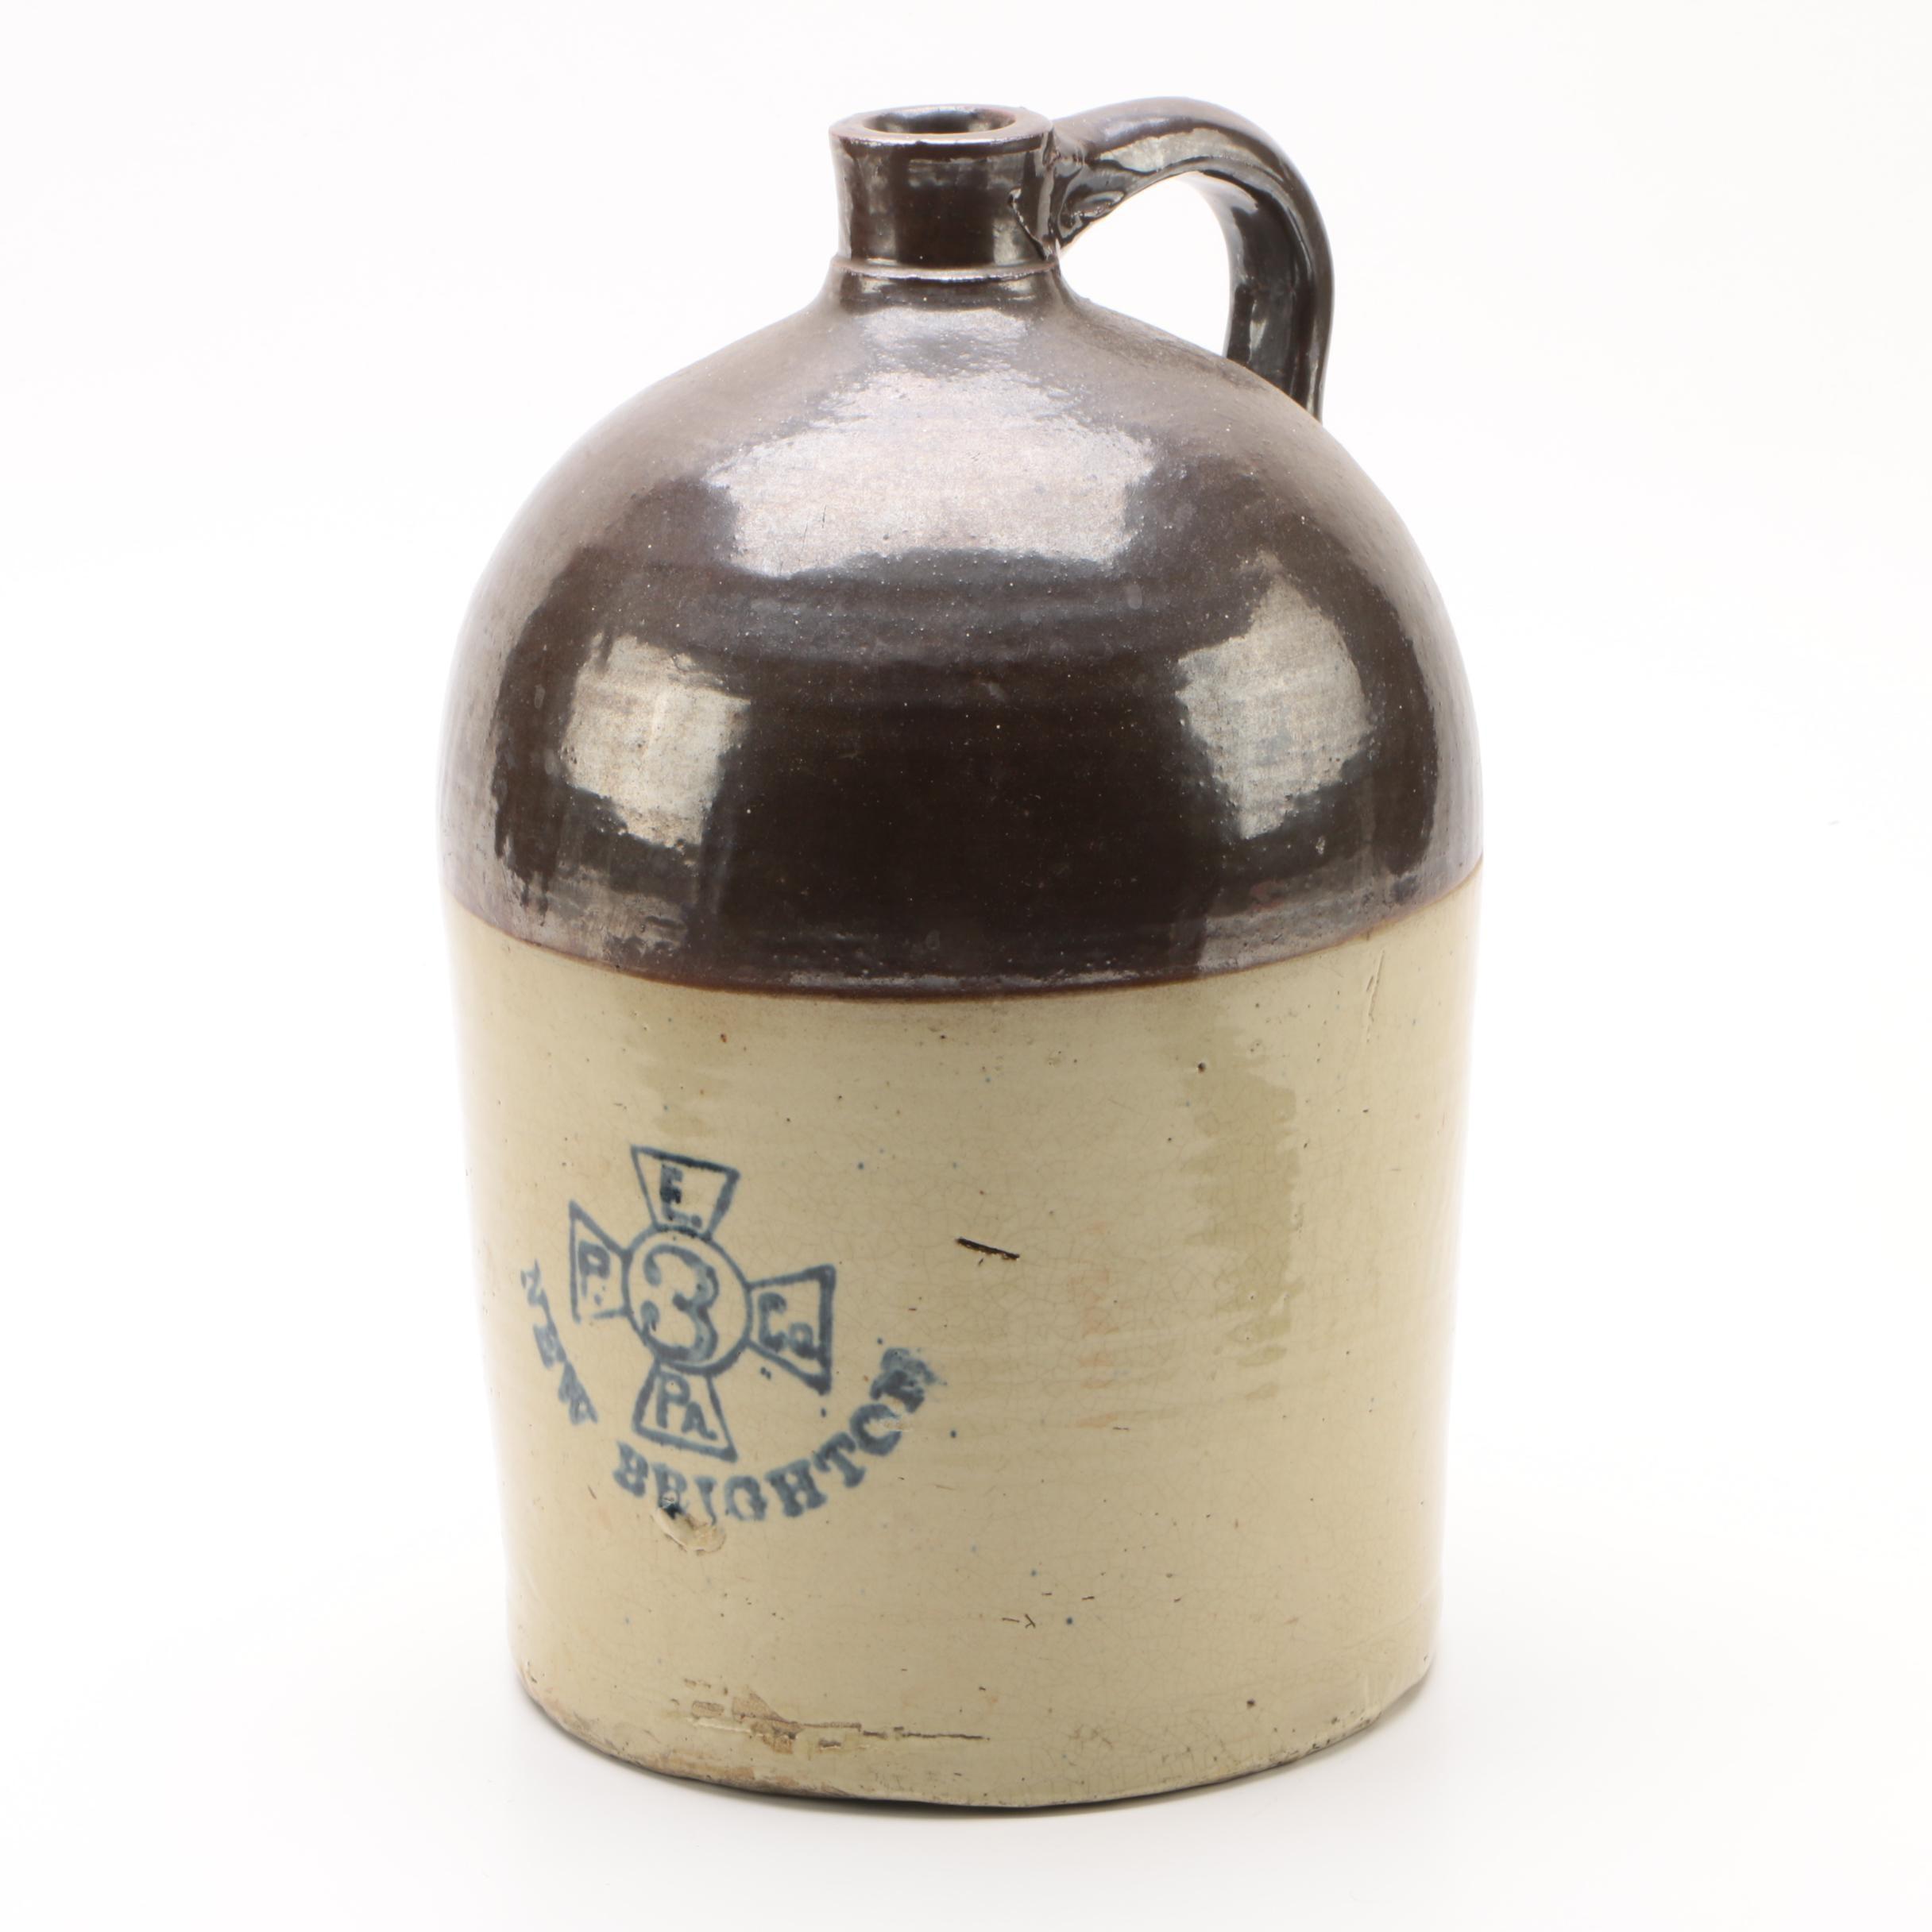 Enterprise Pottery Co. 3-Gallon Stoneware Jug, Late 19th/ Early 20th Century